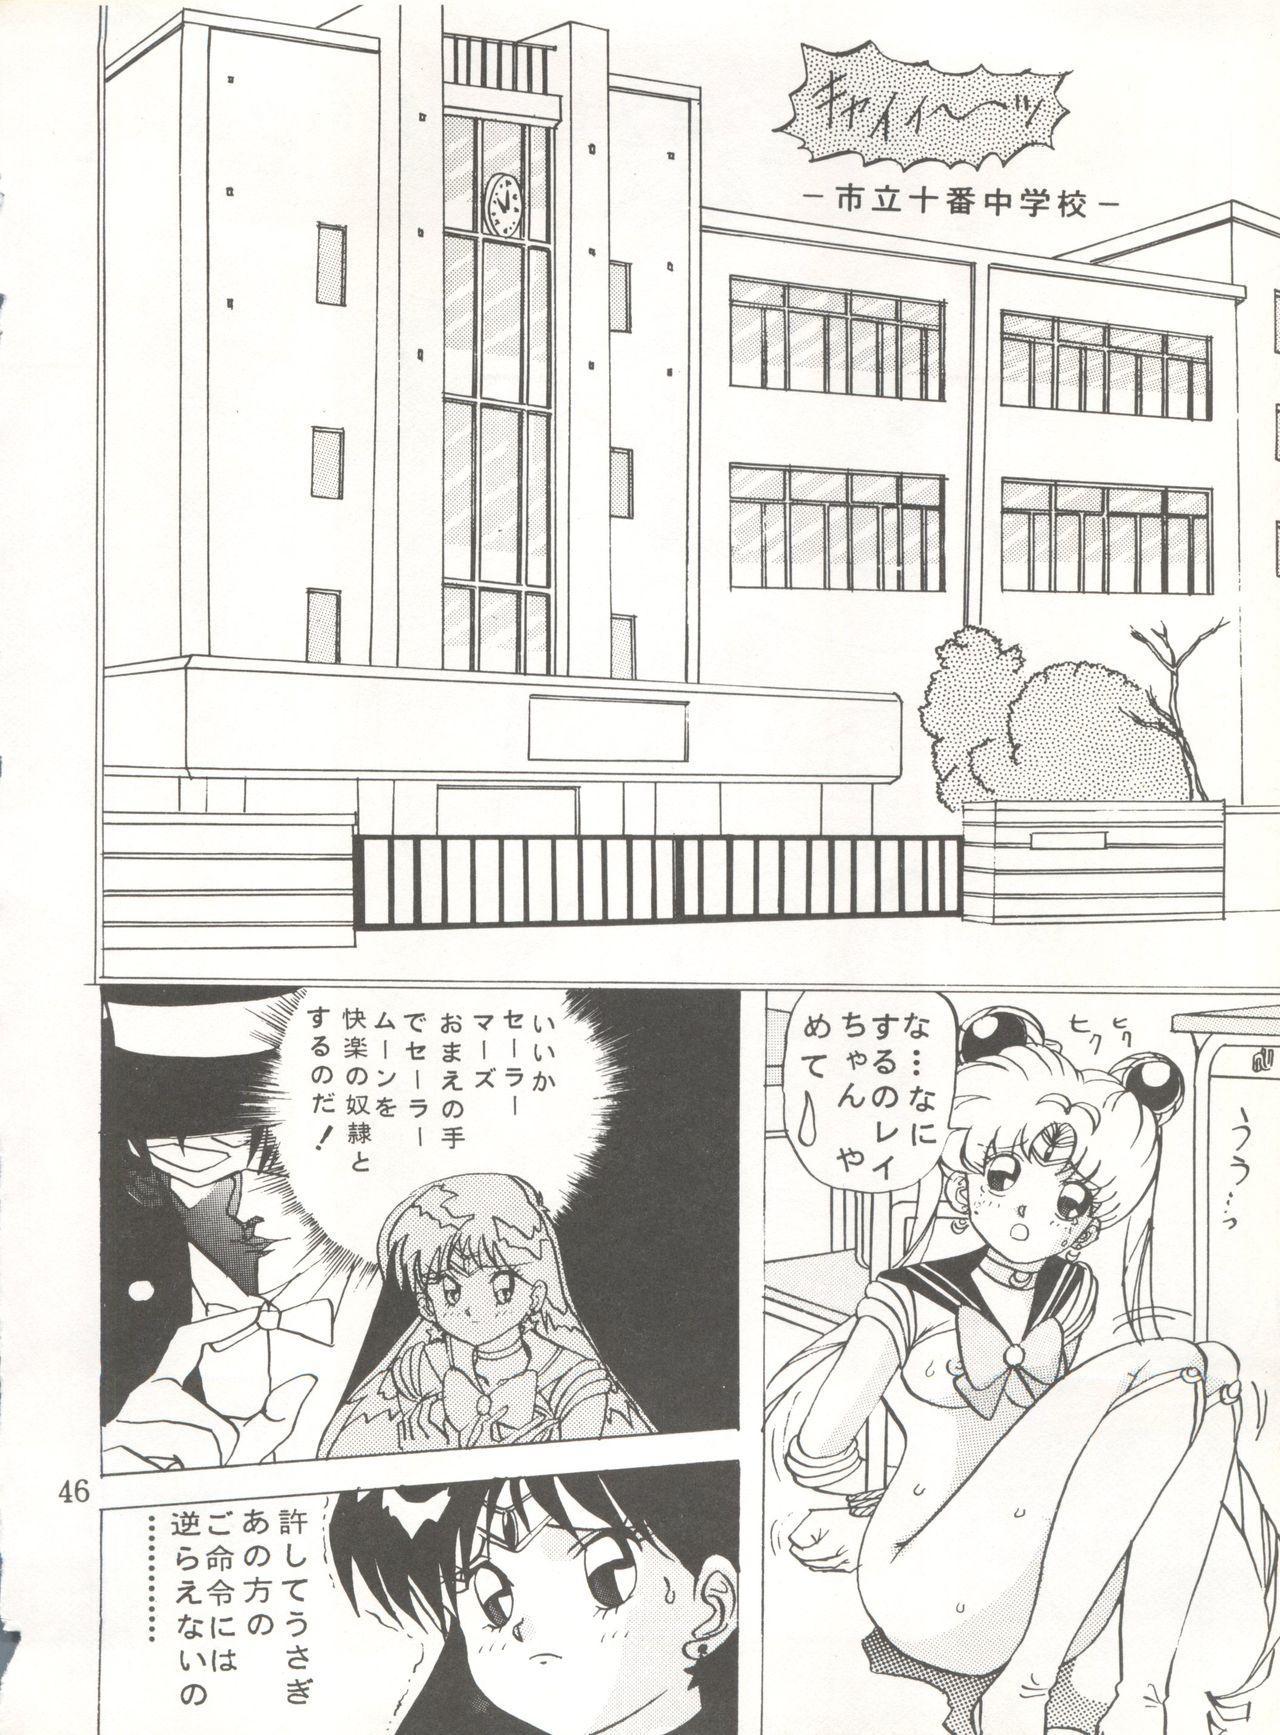 [Global One (MARO)] Sadistic 5 (Cutey Honey, Devilman, Sailor Moon), [Global One (MARO)] Sadistic (Dirty Pair, Fushigi no Umi no Nadia, Sailor Moon), [Studio Ikkatsumajin] .ribbon (Hime-chan's Ribbon) 45